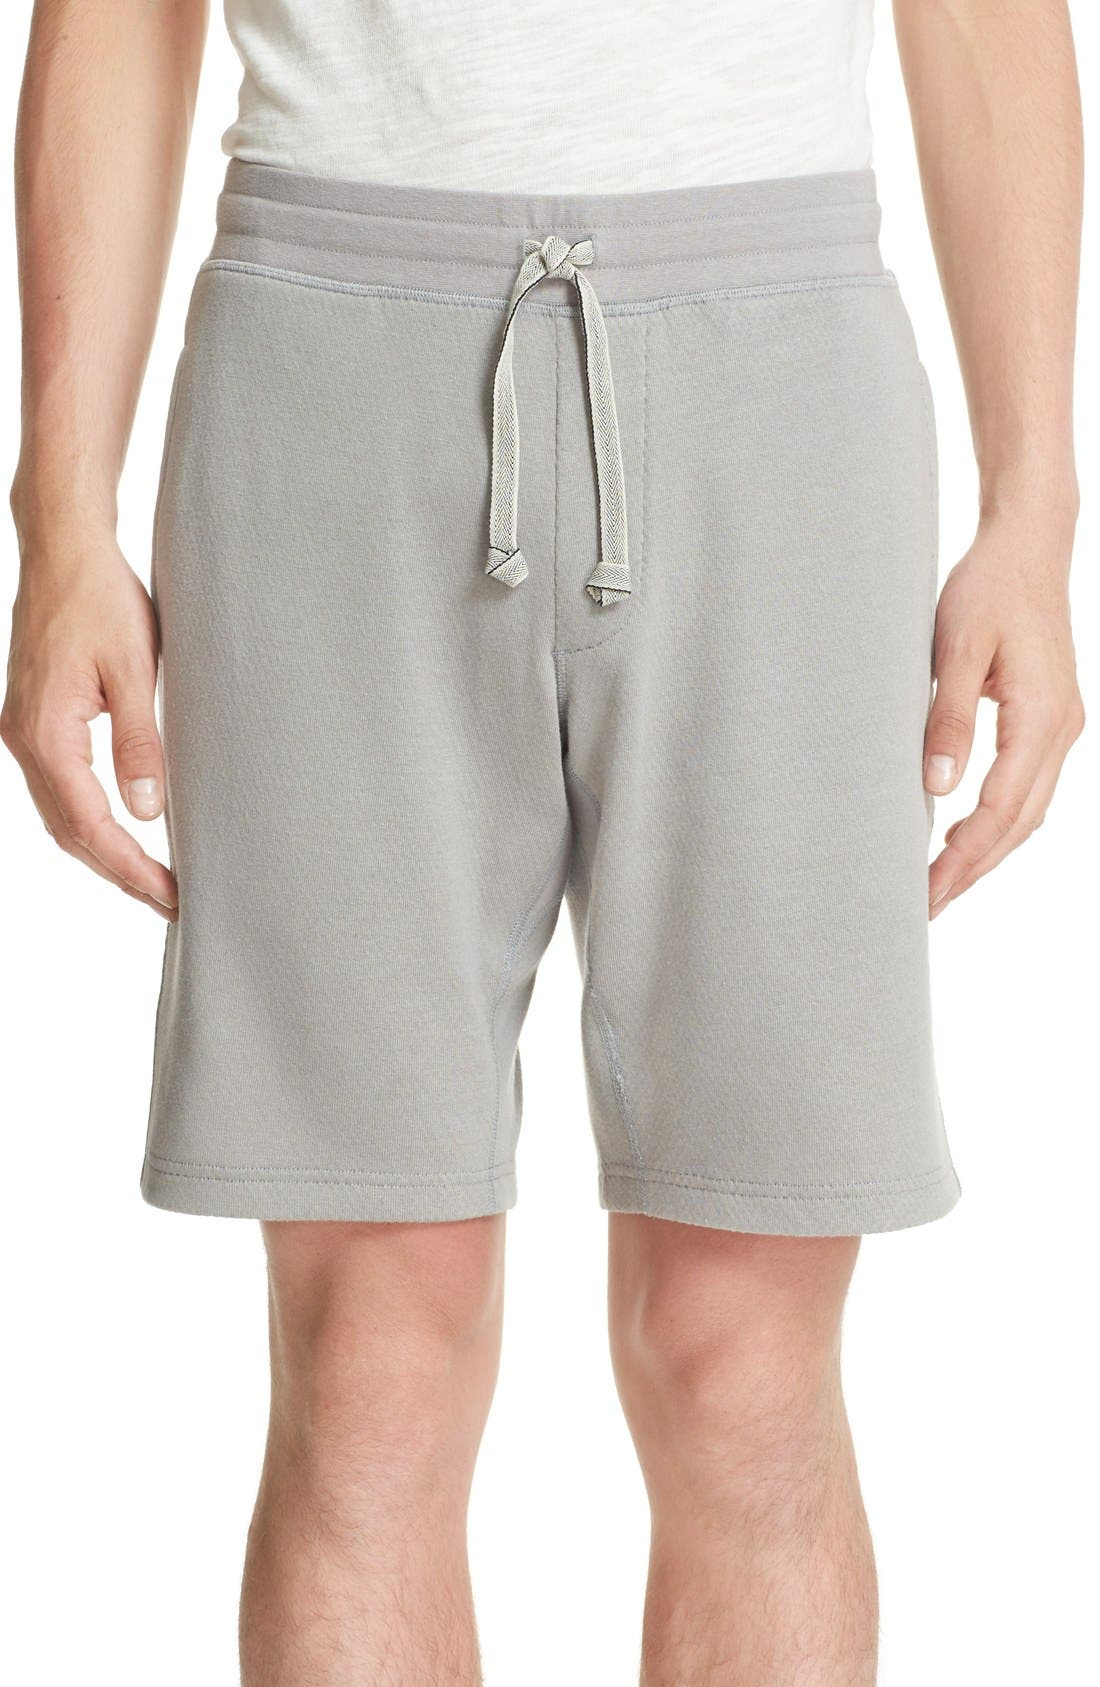 Main Image - wings + horns x adidas Bonded Jersey Shorts